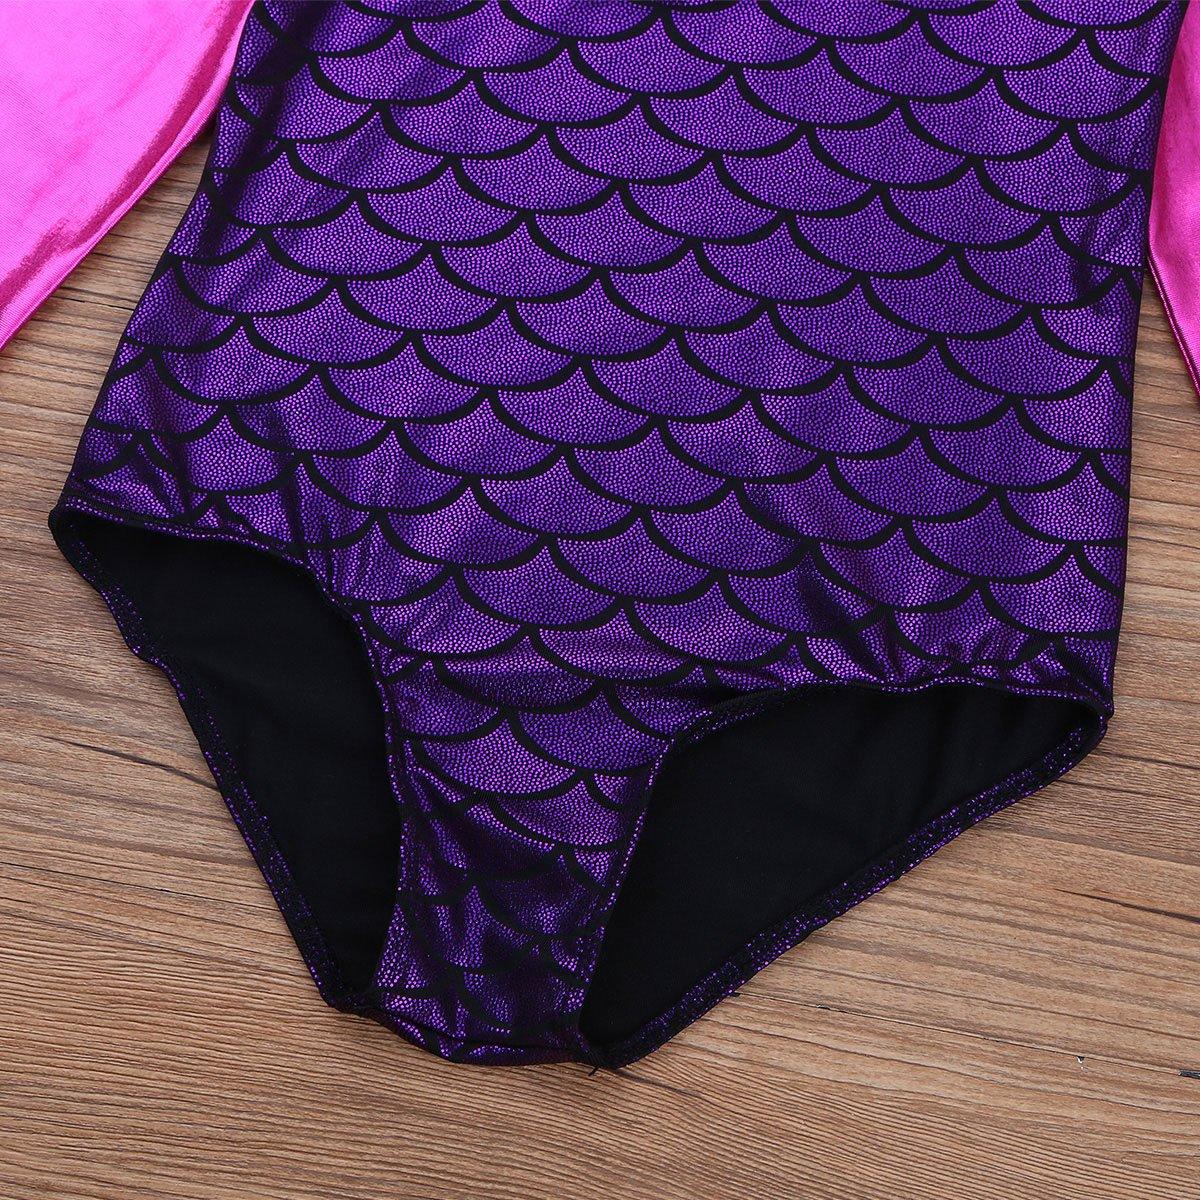 MSemis Kids Girls Long Sleeves Shiny Metallic Mermaid Ballet Leotard Dancewear Gymnastics Unitard Jumpsuit